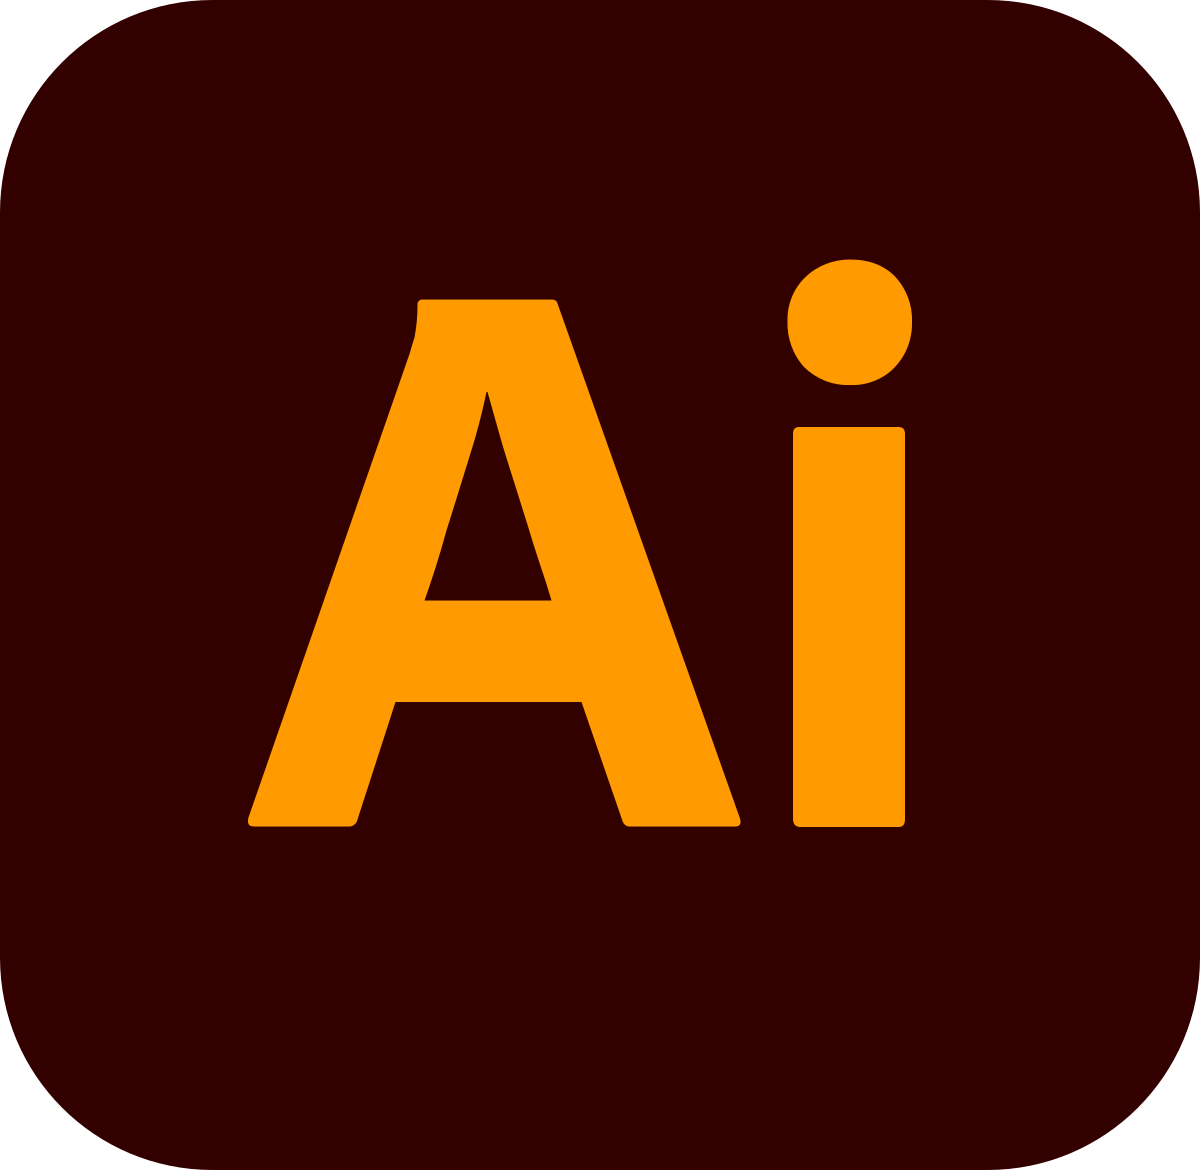 Adobe Illustrator Single App